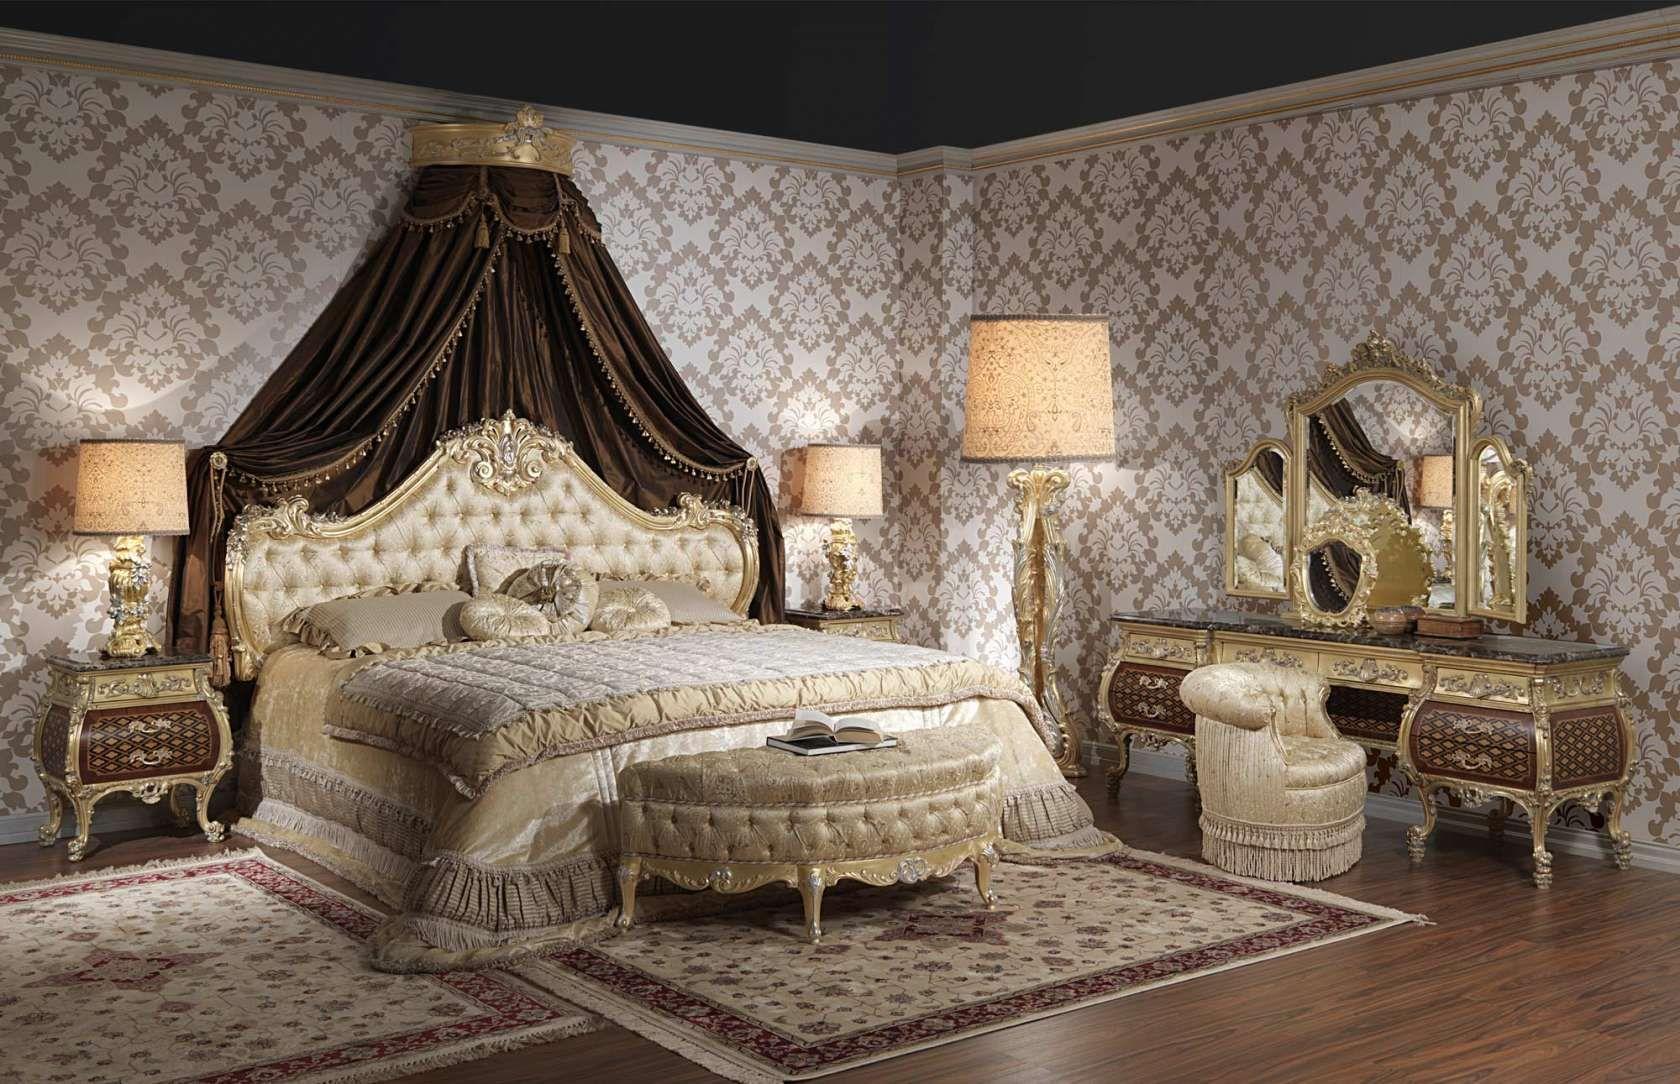 Louis Xv Bedroom Furniture Luxury Bedroom Louis Xv Style Furniture Pinterest Luxury